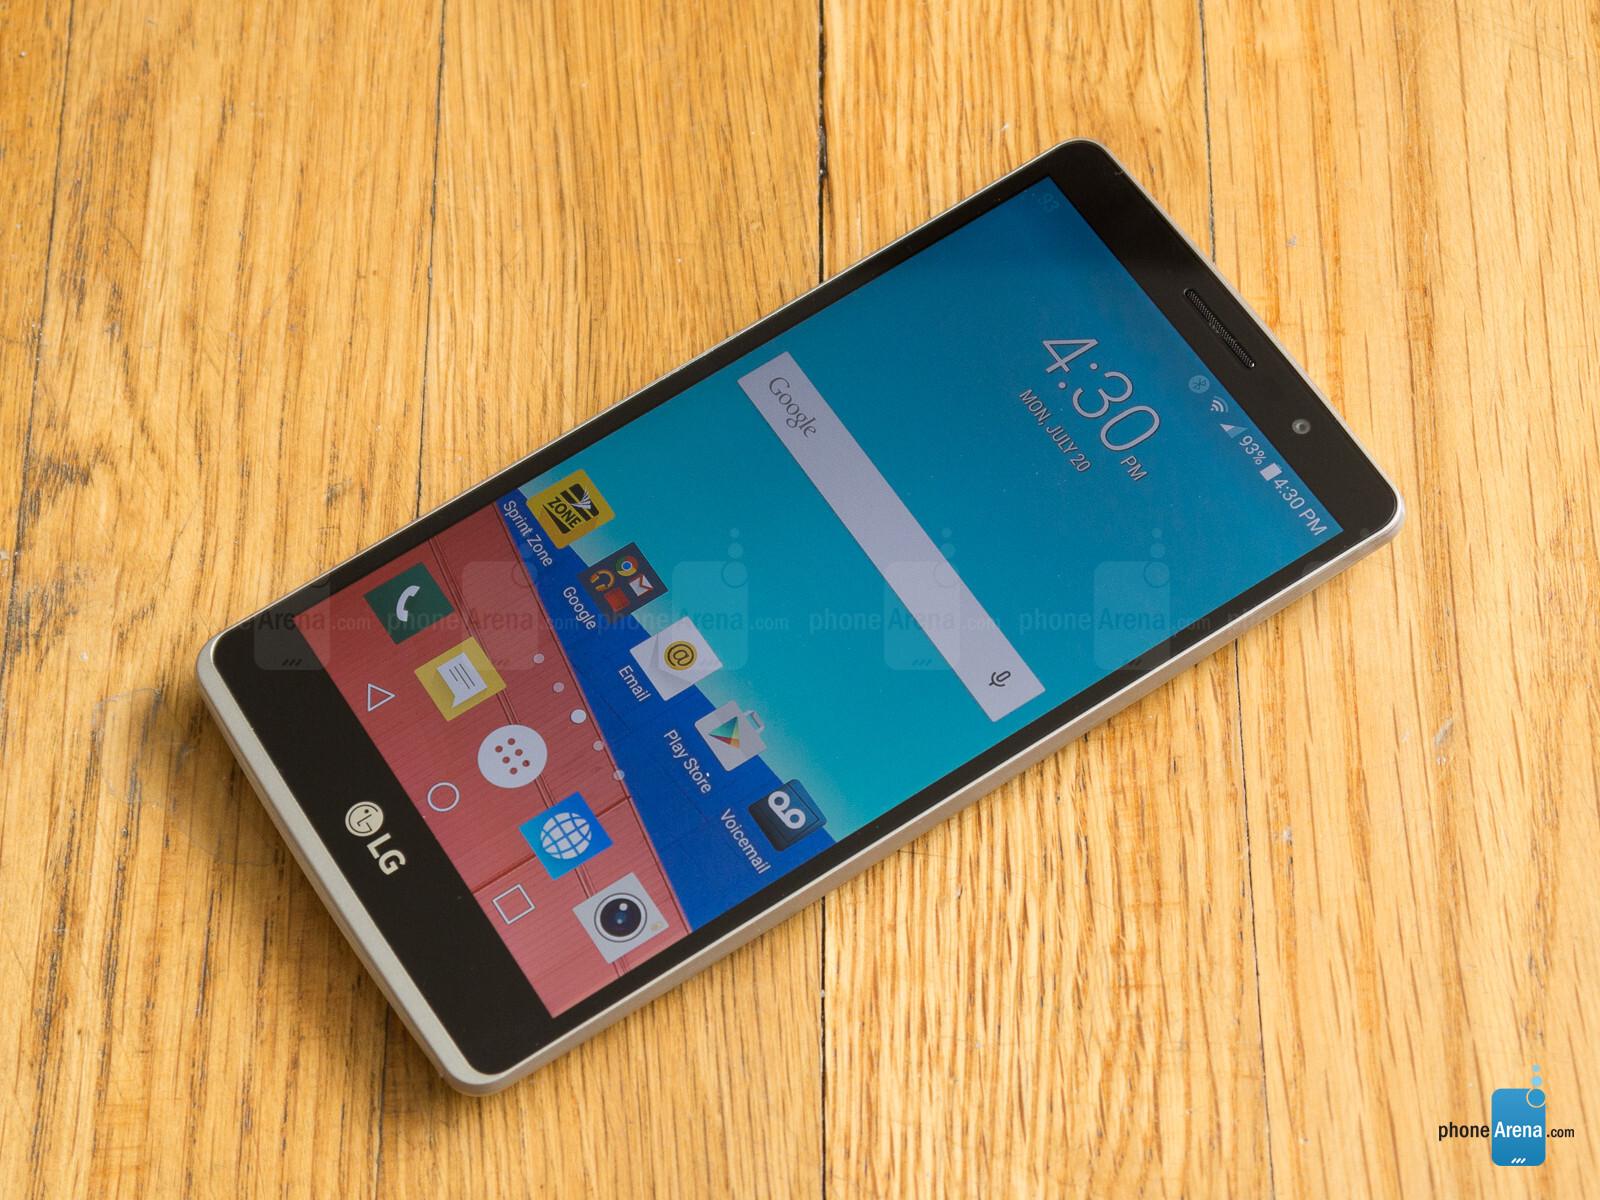 LG G Stylo specs Verizon Motorola 4g Phones